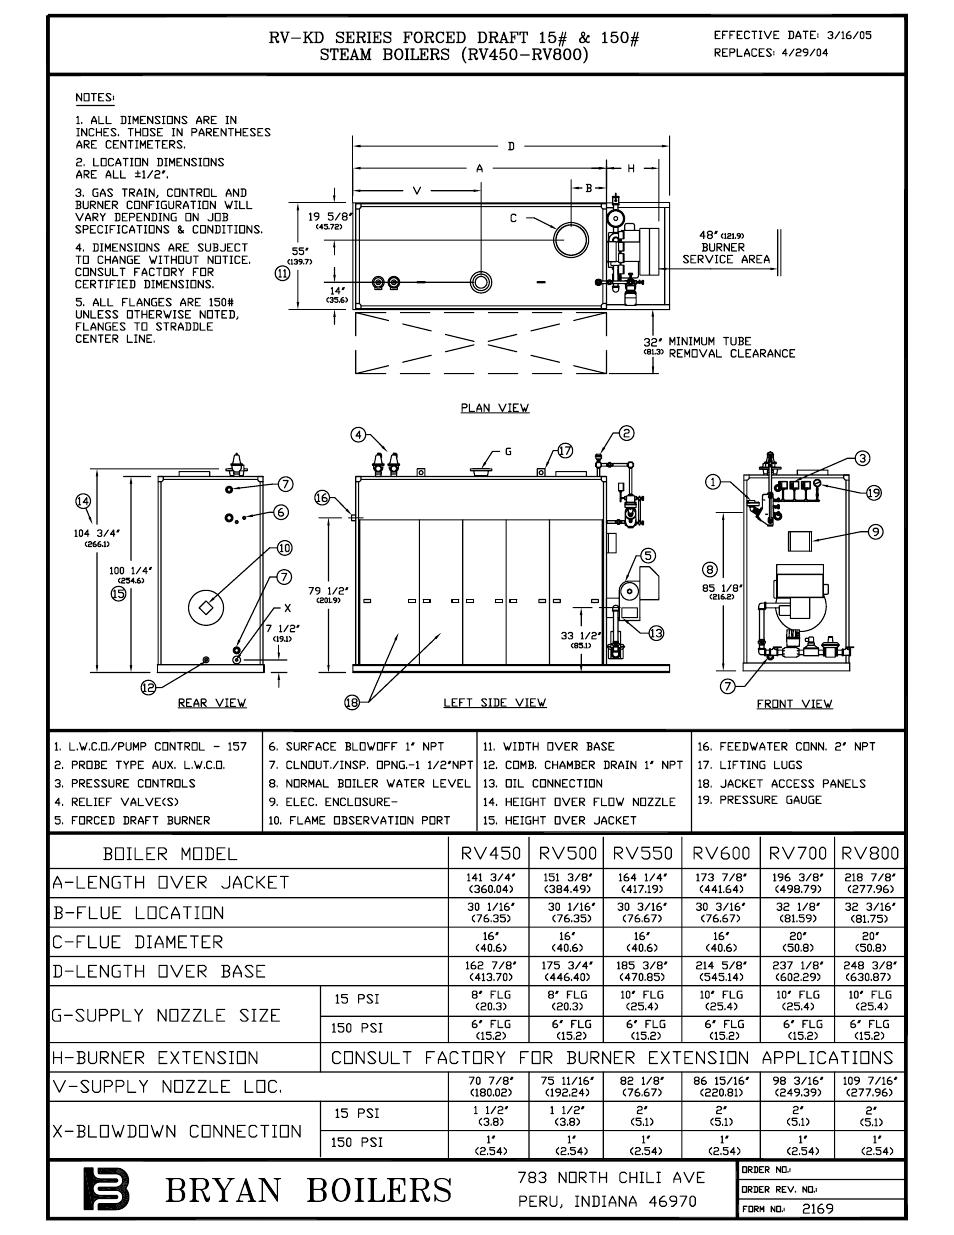 bryan boilers rv450 page1 bryan boiler wiring diagram boiler parts catalog, boiler flow bryan boiler wiring diagram at mifinder.co